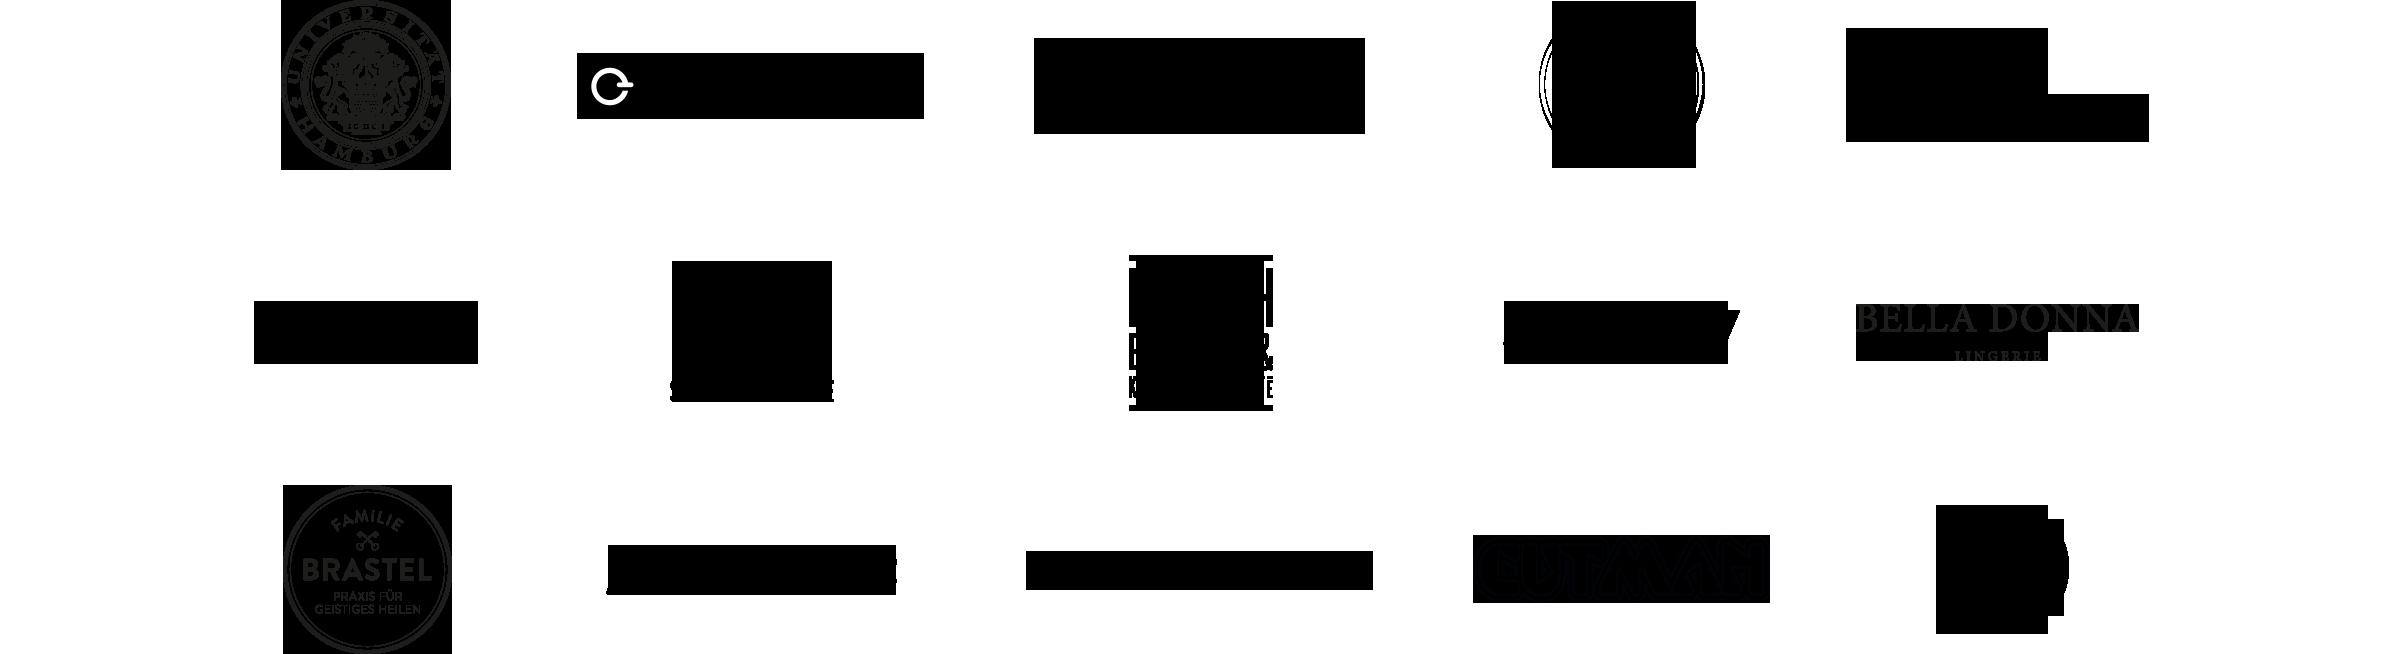 moinmarco-referenzen-logos.png